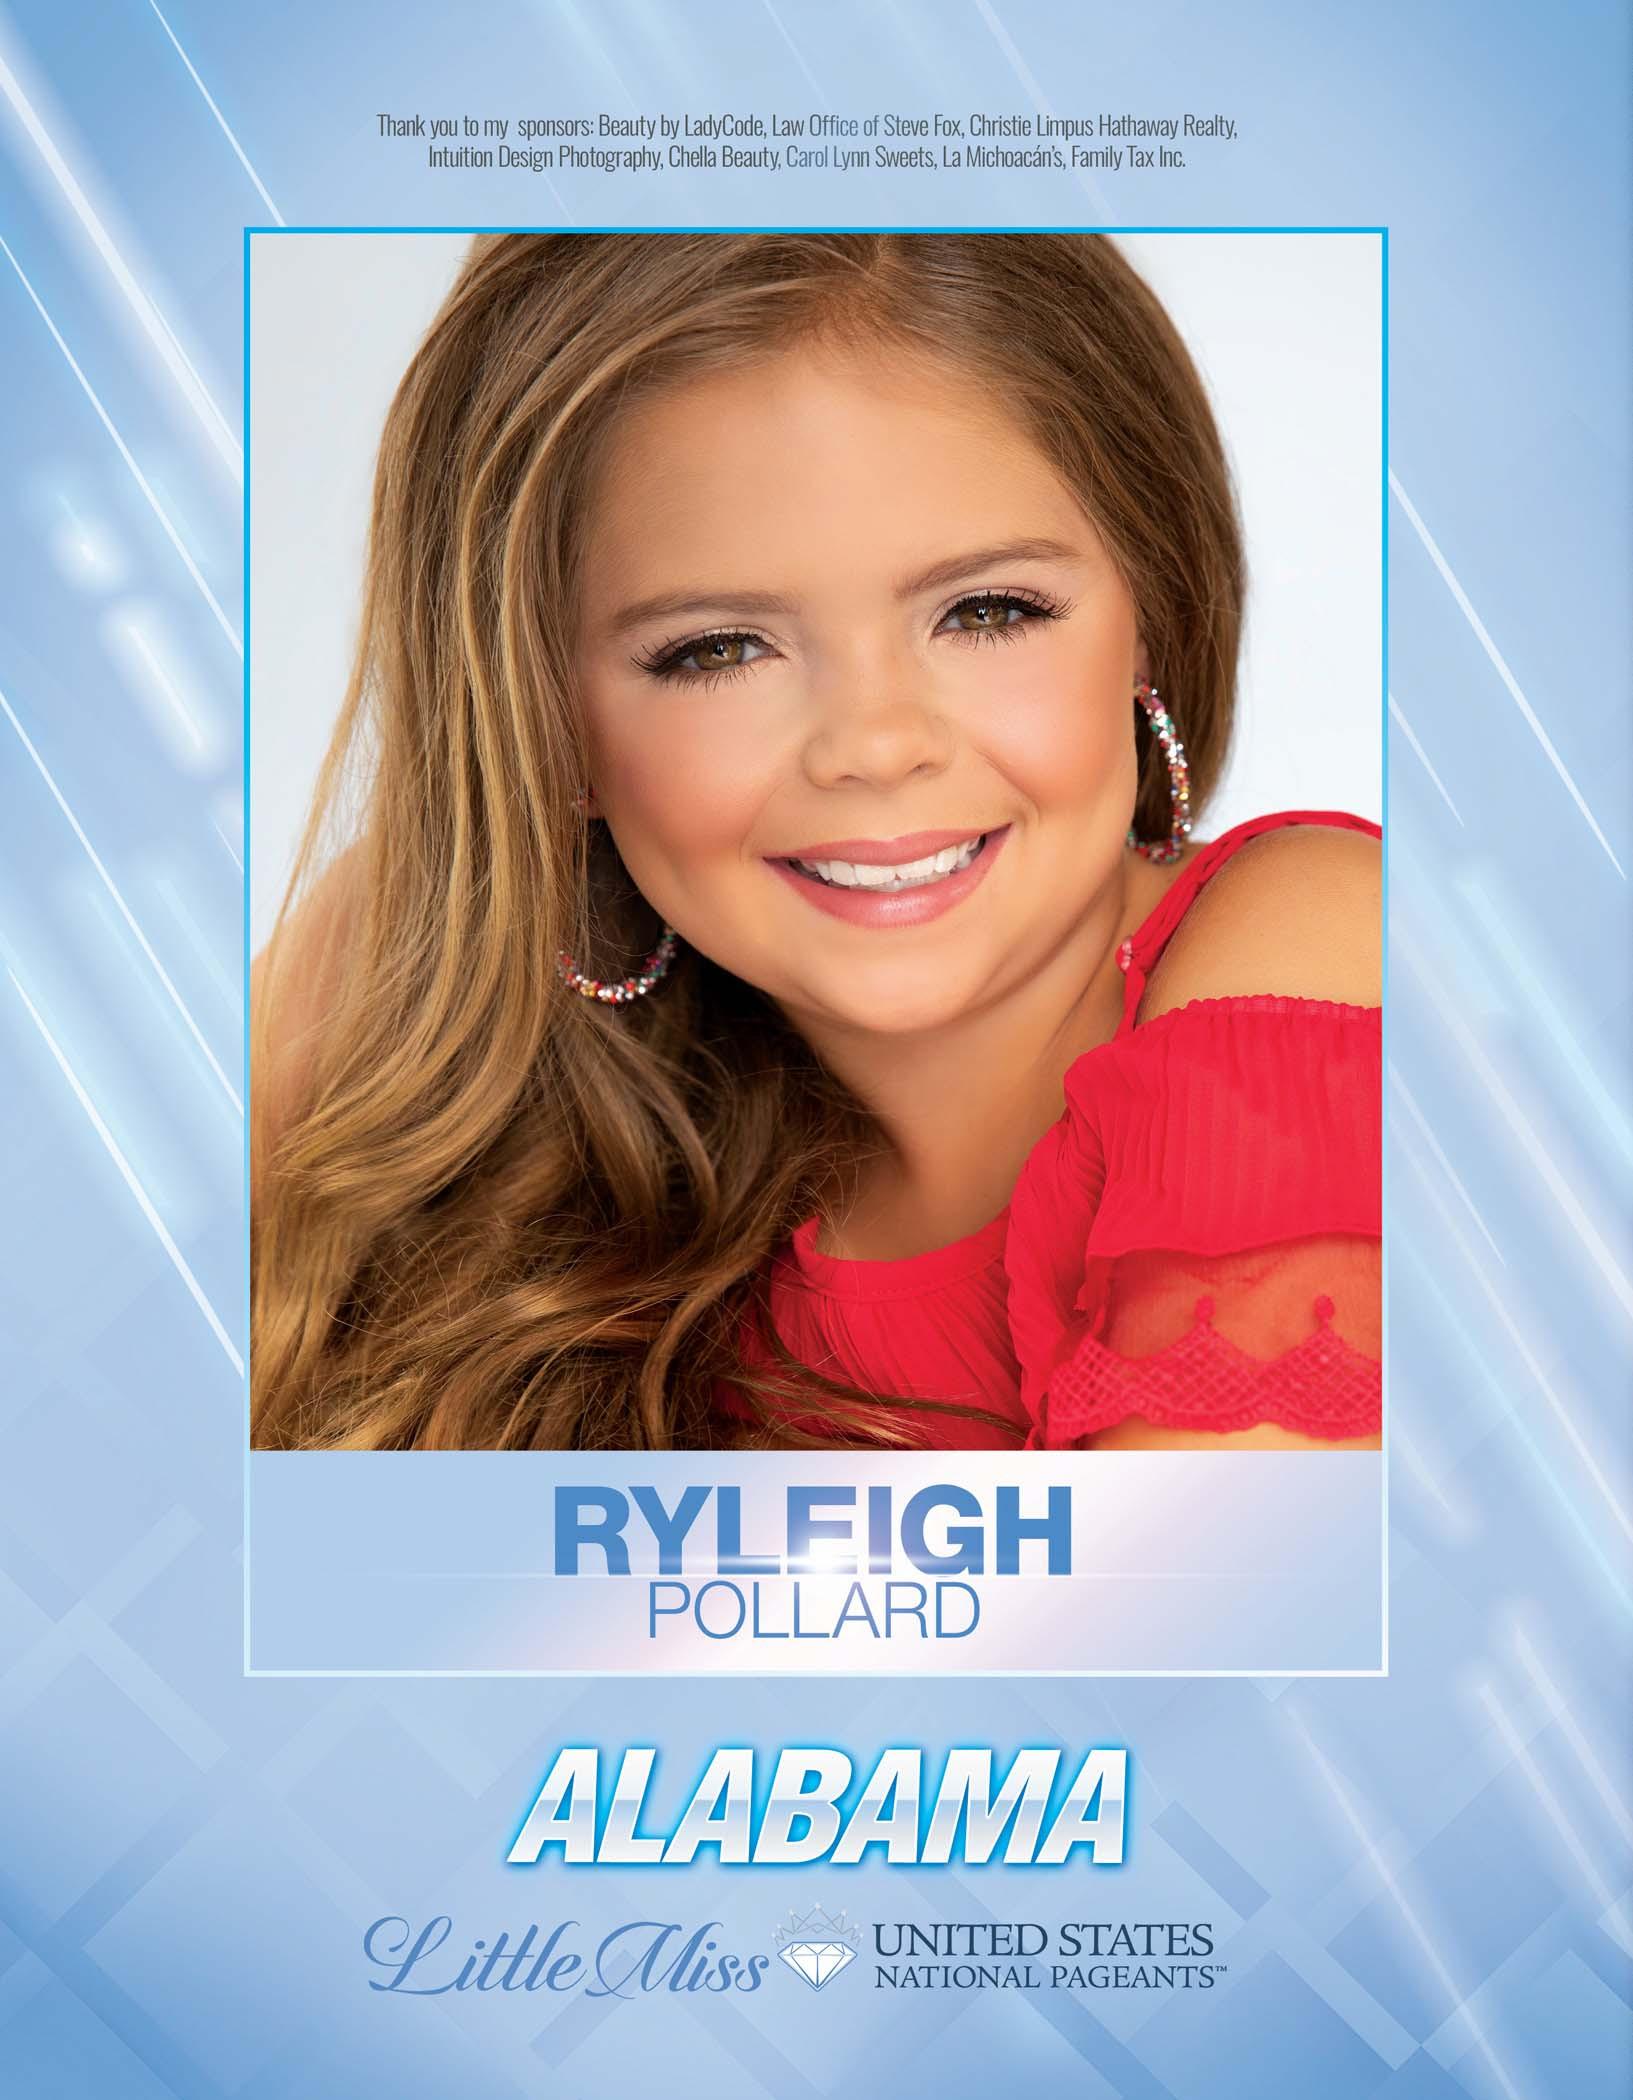 Ryleigh Pollard Little Miss Alabama United States - 2021